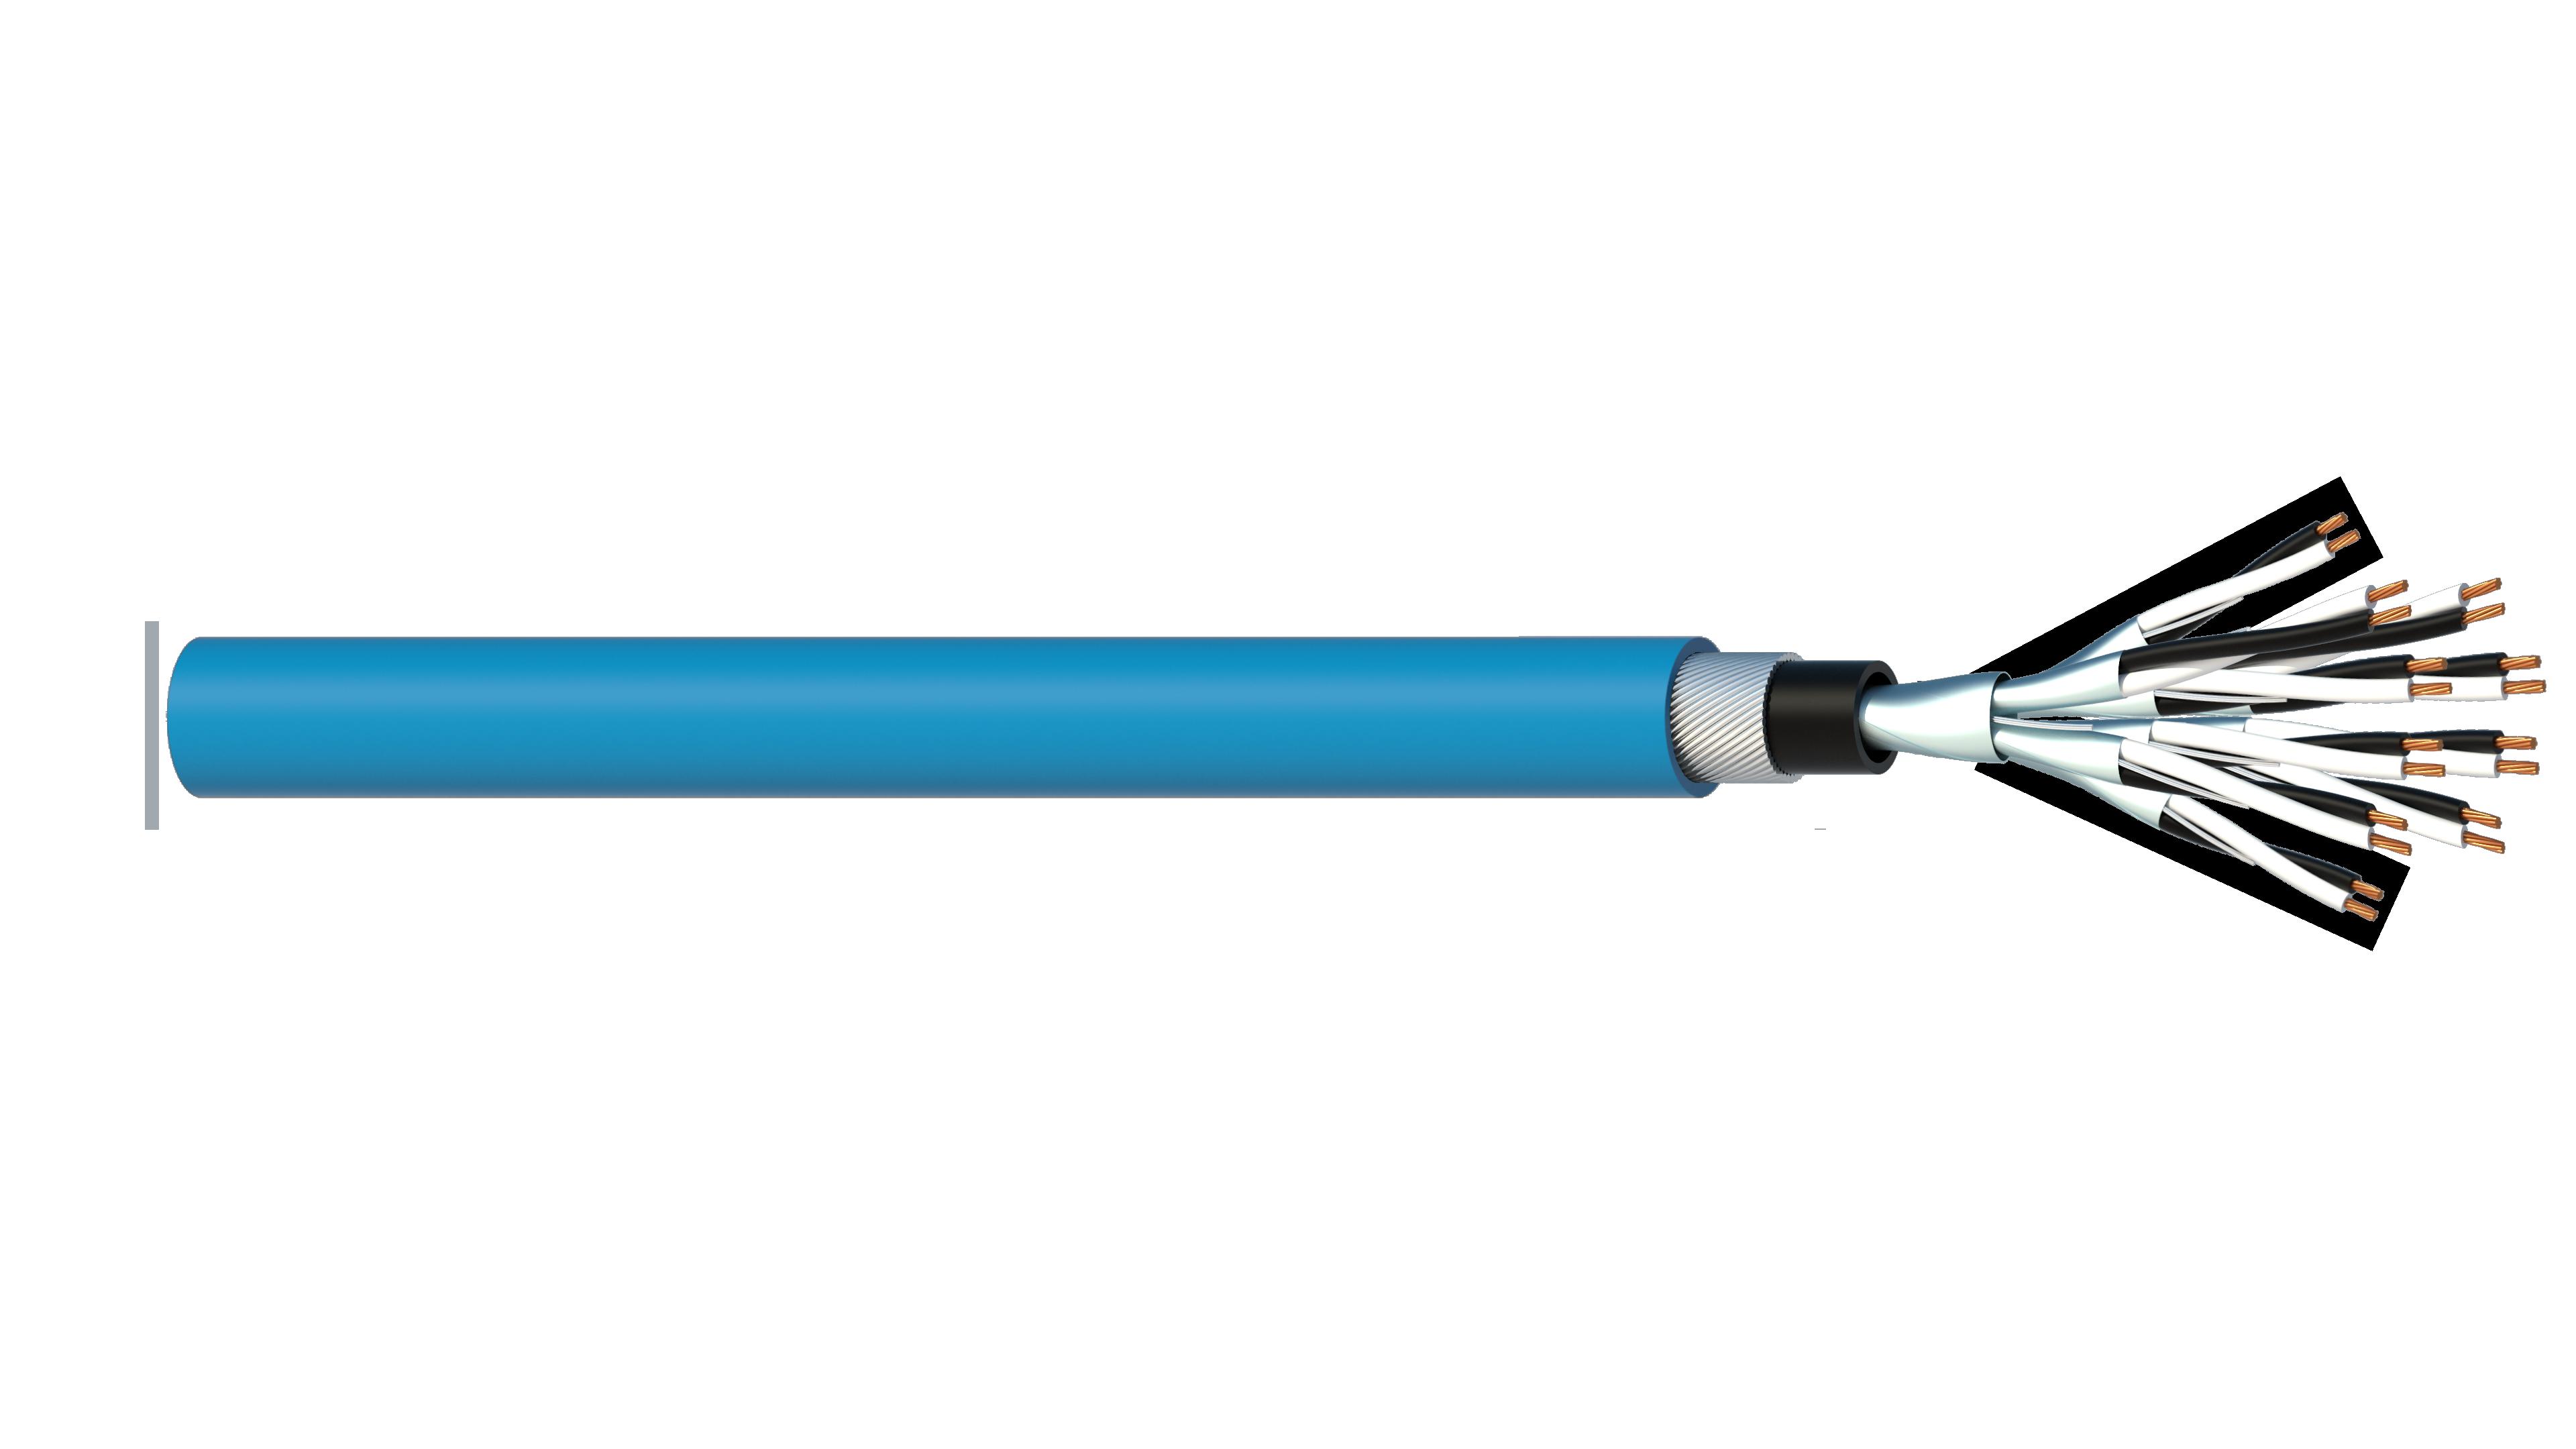 10 Pair 1.5mm2 Cu/PVC/ISOS/PVC/SWA/PVC Maser Instrumentation Cable - Blue Sheath